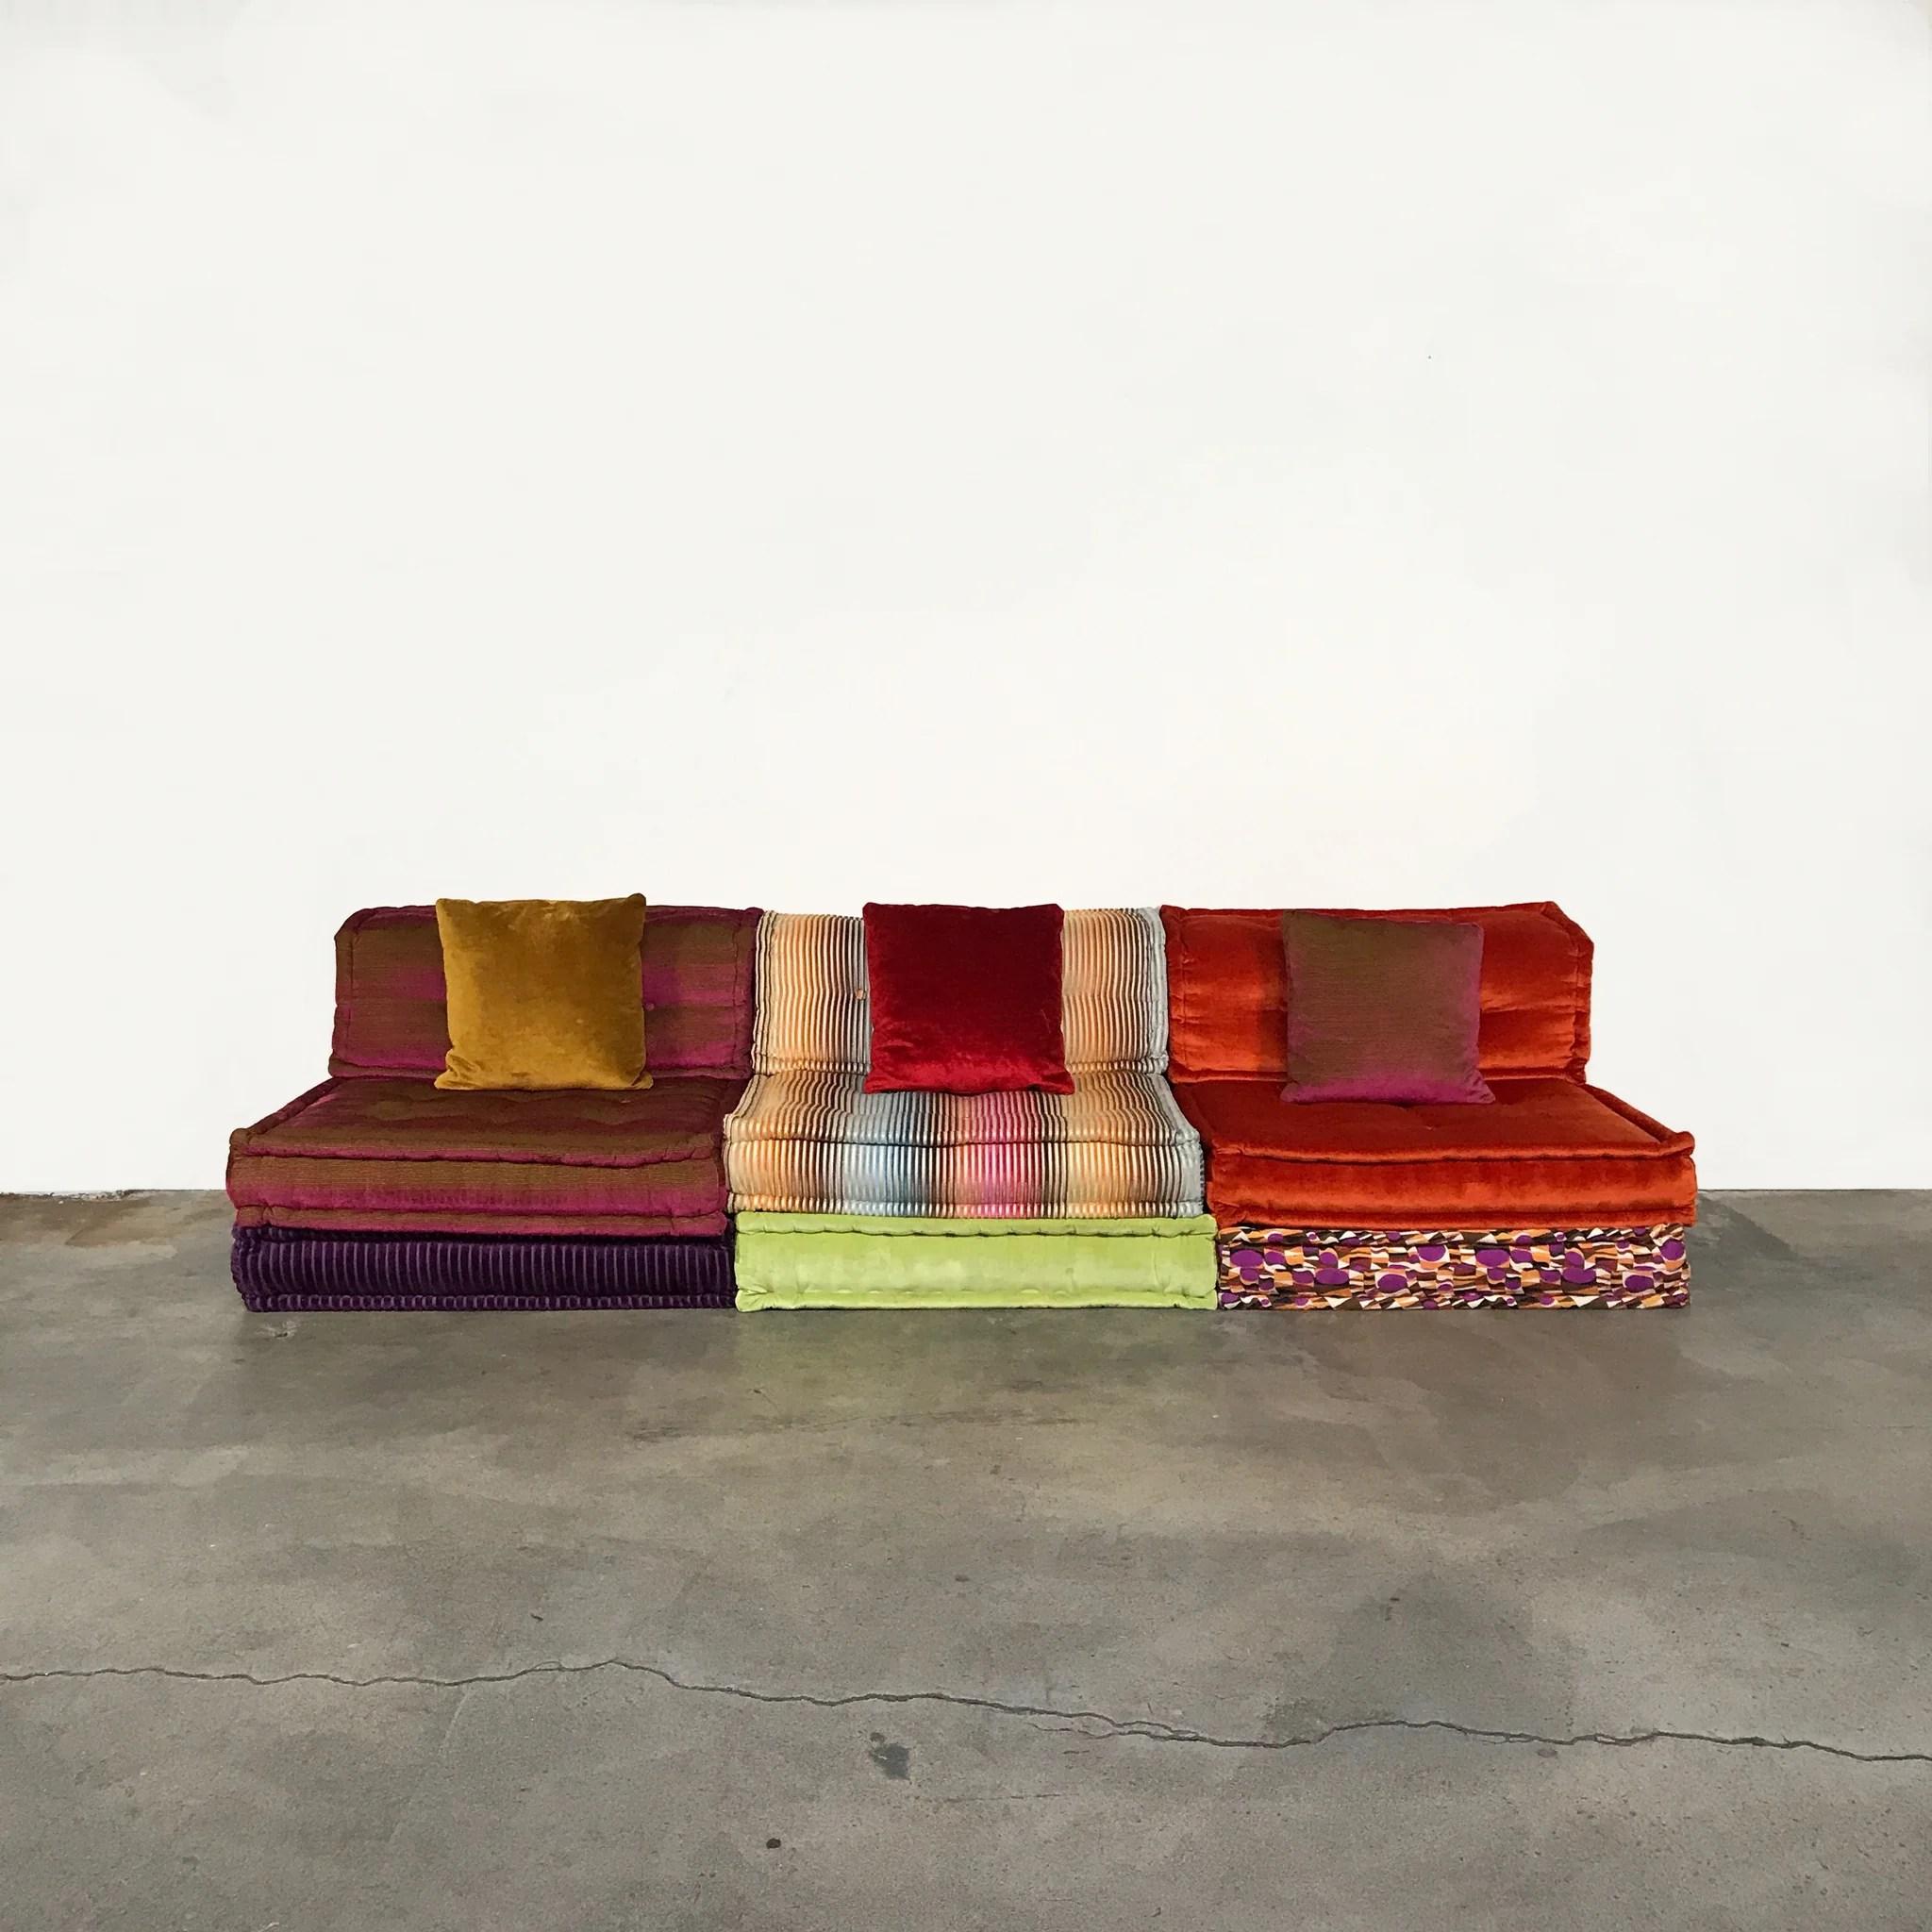 mah jong modular sofa preis big w bed roche bobois multi colored by hans